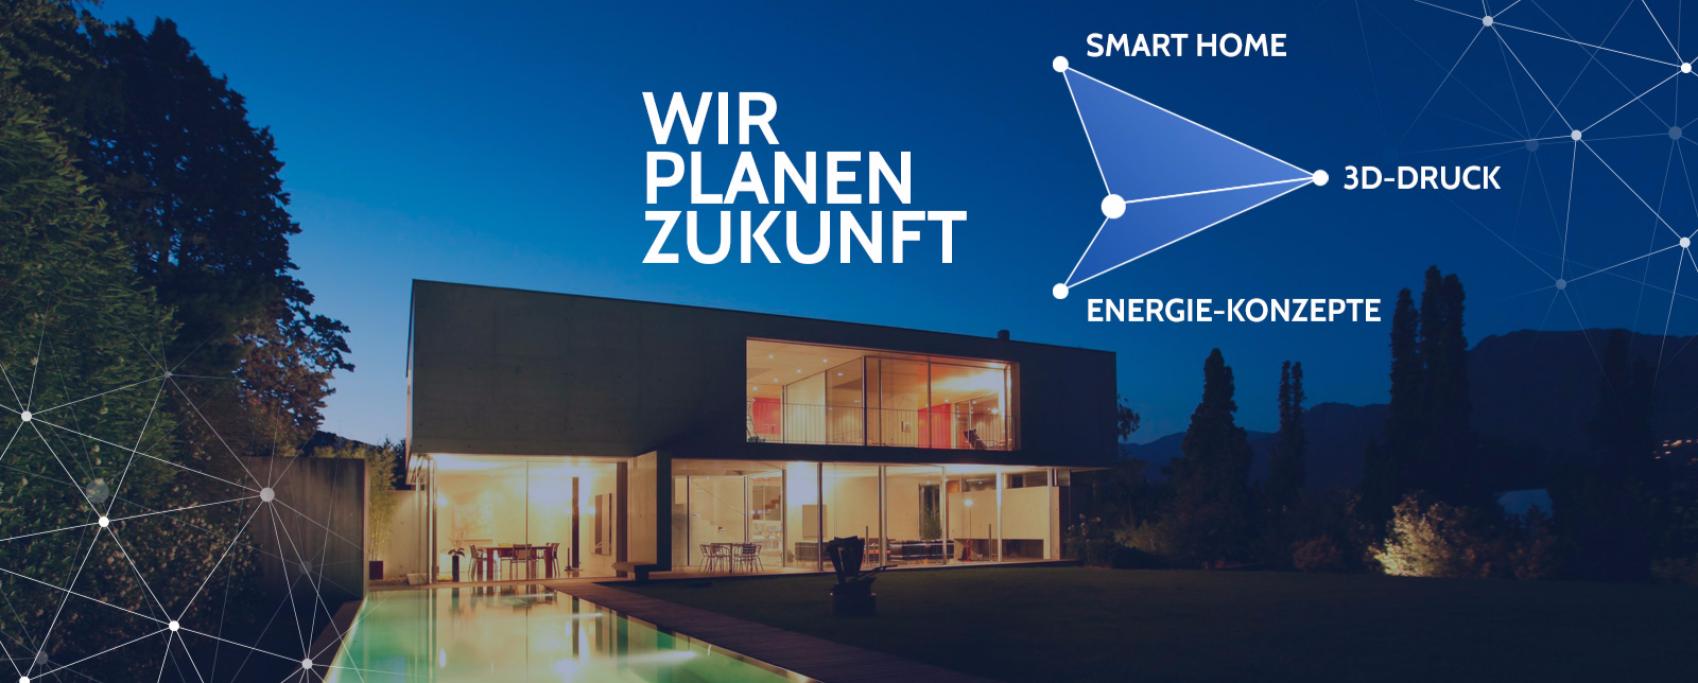 Wir Planen Zukunft - Smart Home, 3D-Druck, Energie-Konzepte